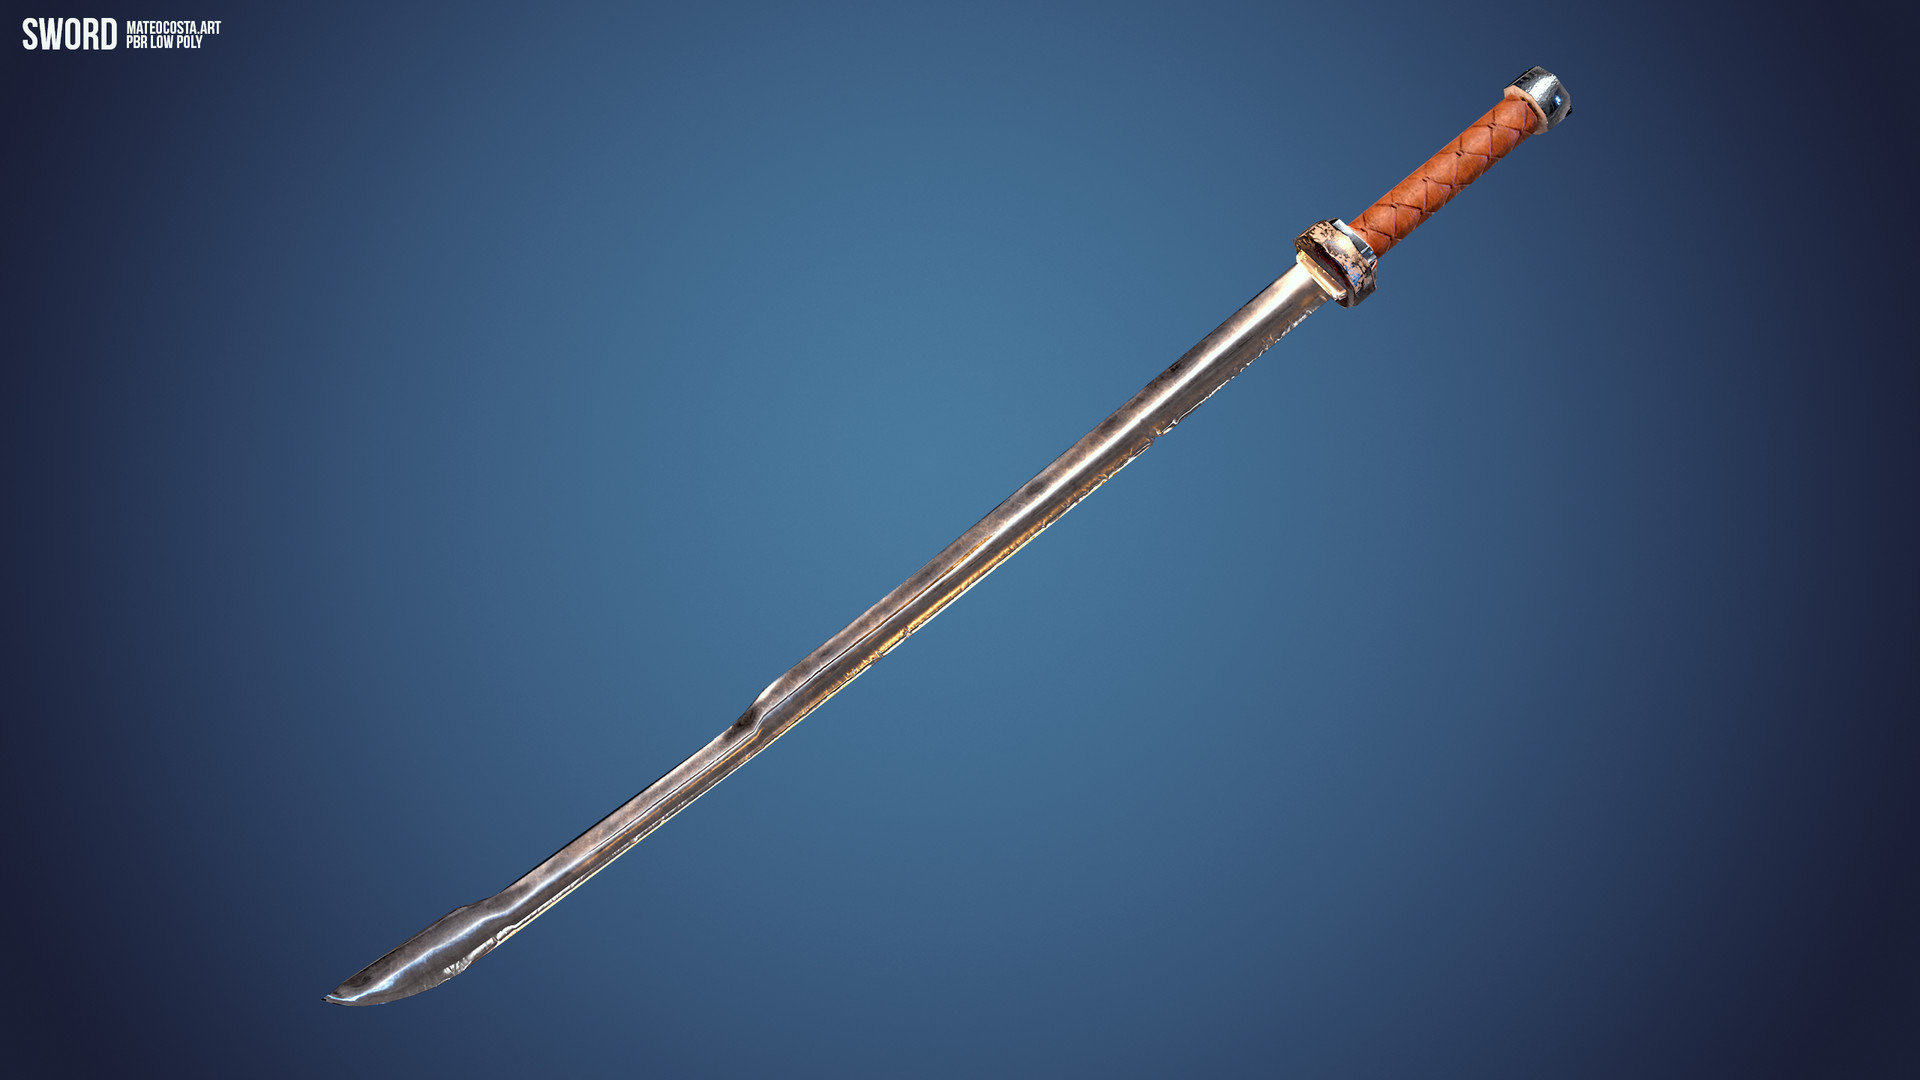 Mateo costa sword bpr1